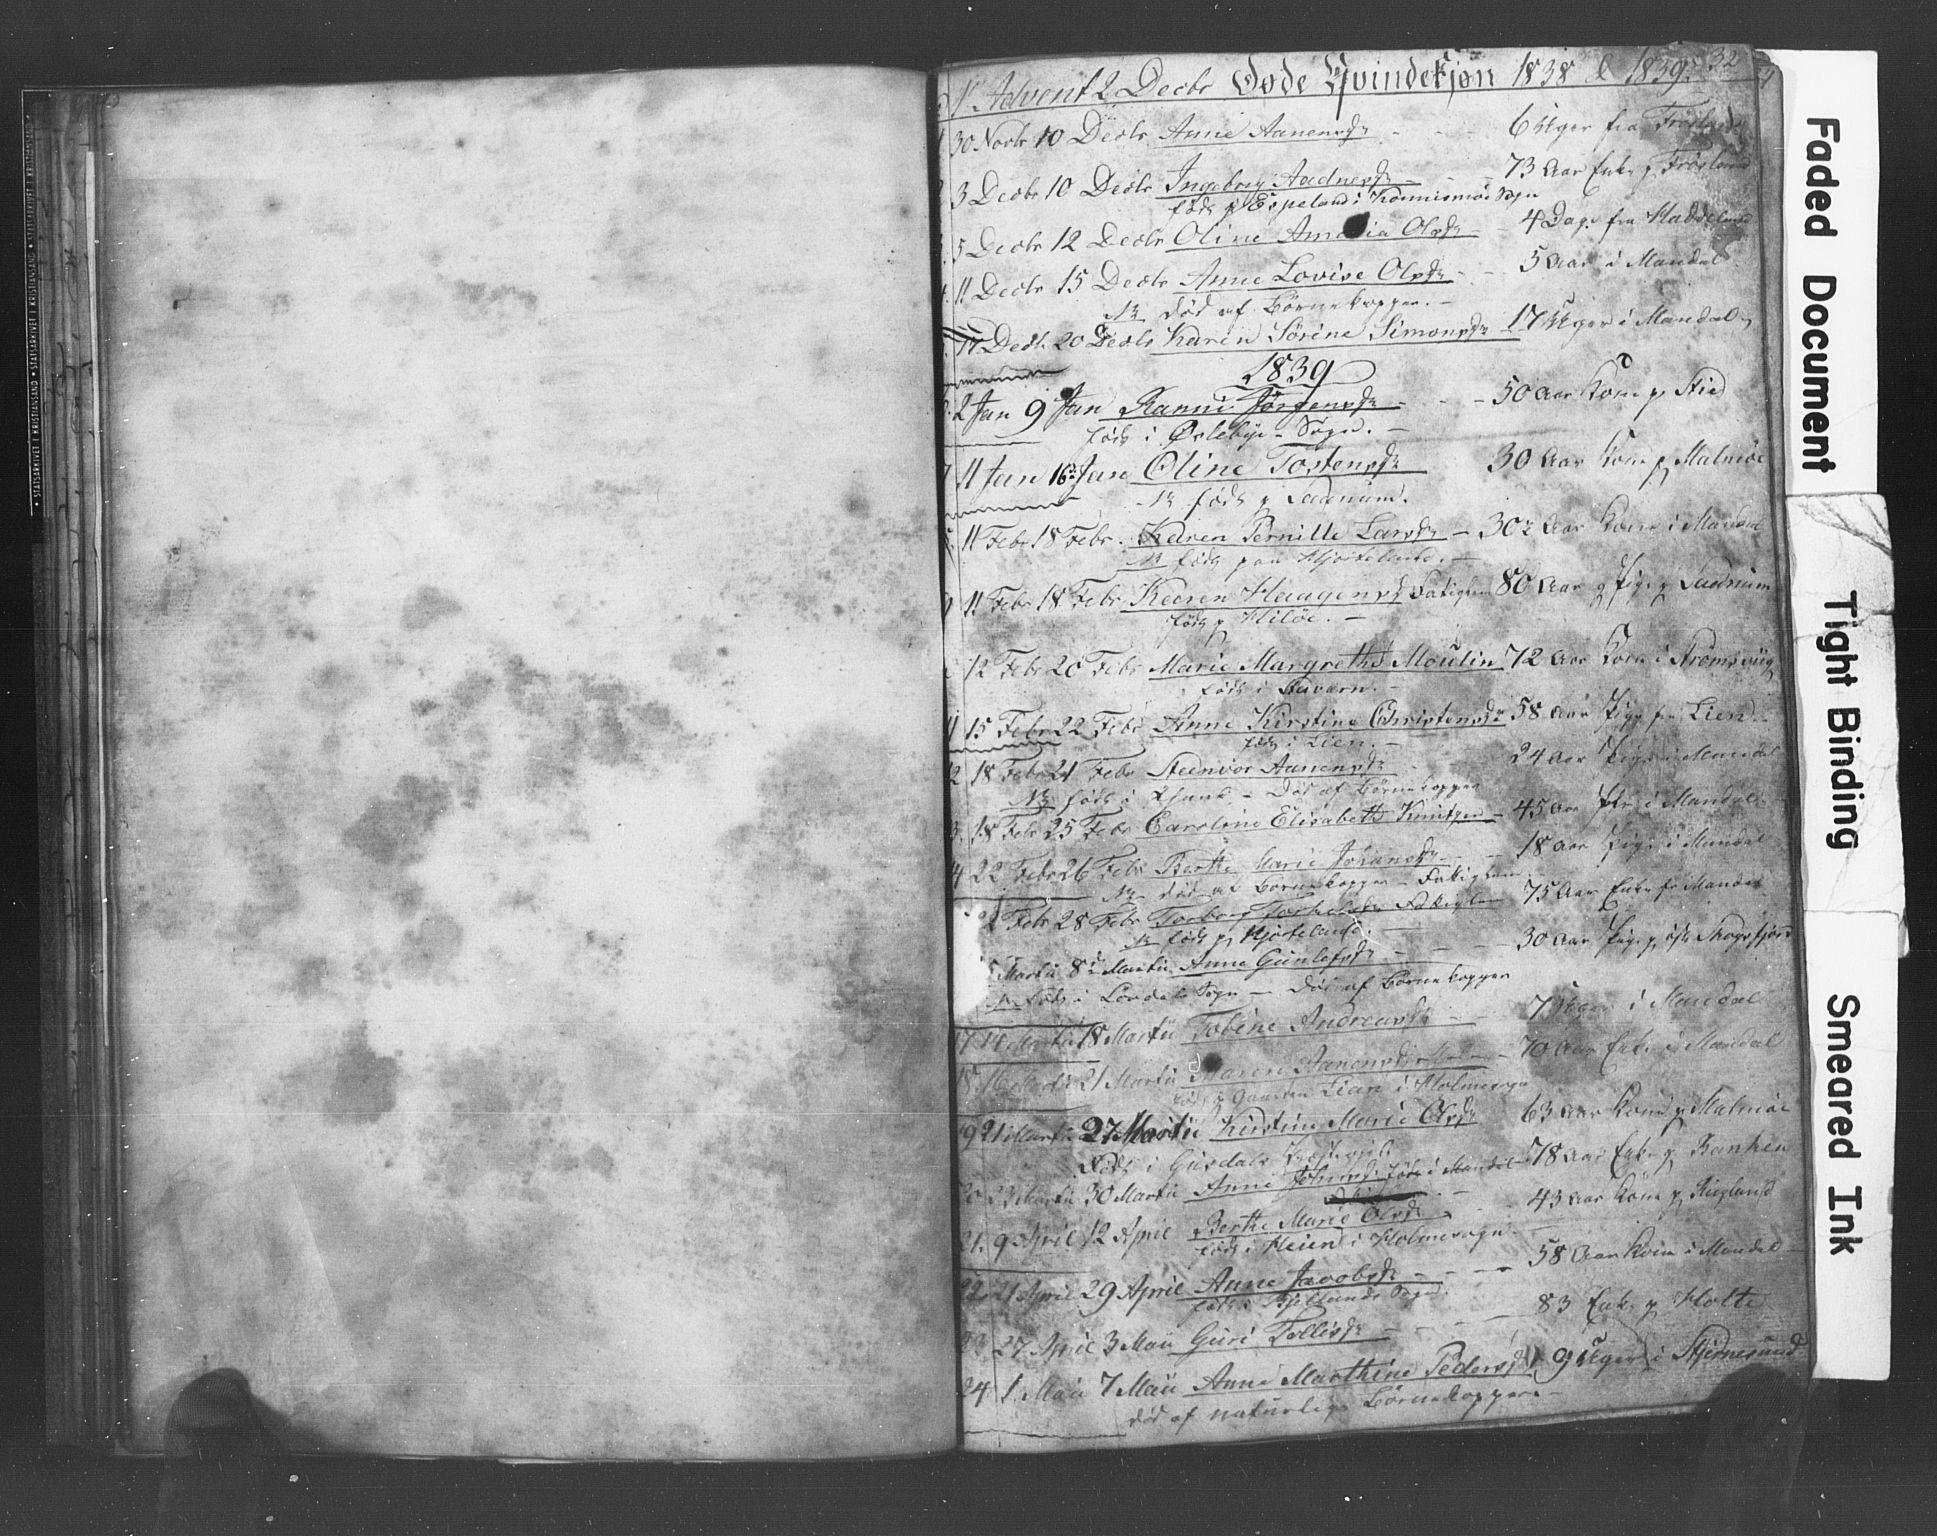 SAK, Mandal sokneprestkontor, F/Fb/Fba/L0004: Klokkerbok nr. B 1D, 1838-1841, s. 32